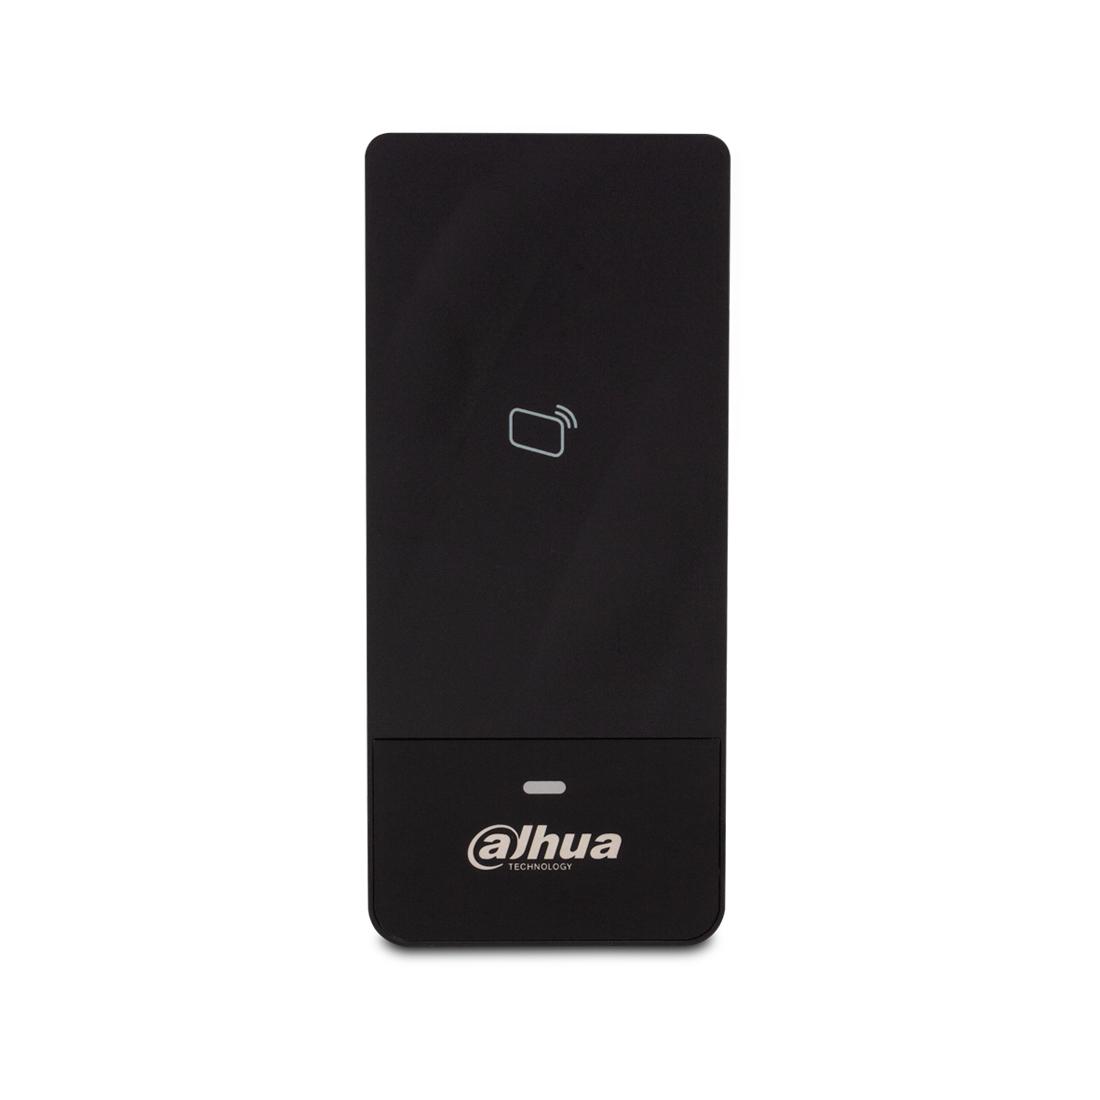 RFID считыватель Dahua DHI-ASR1200E